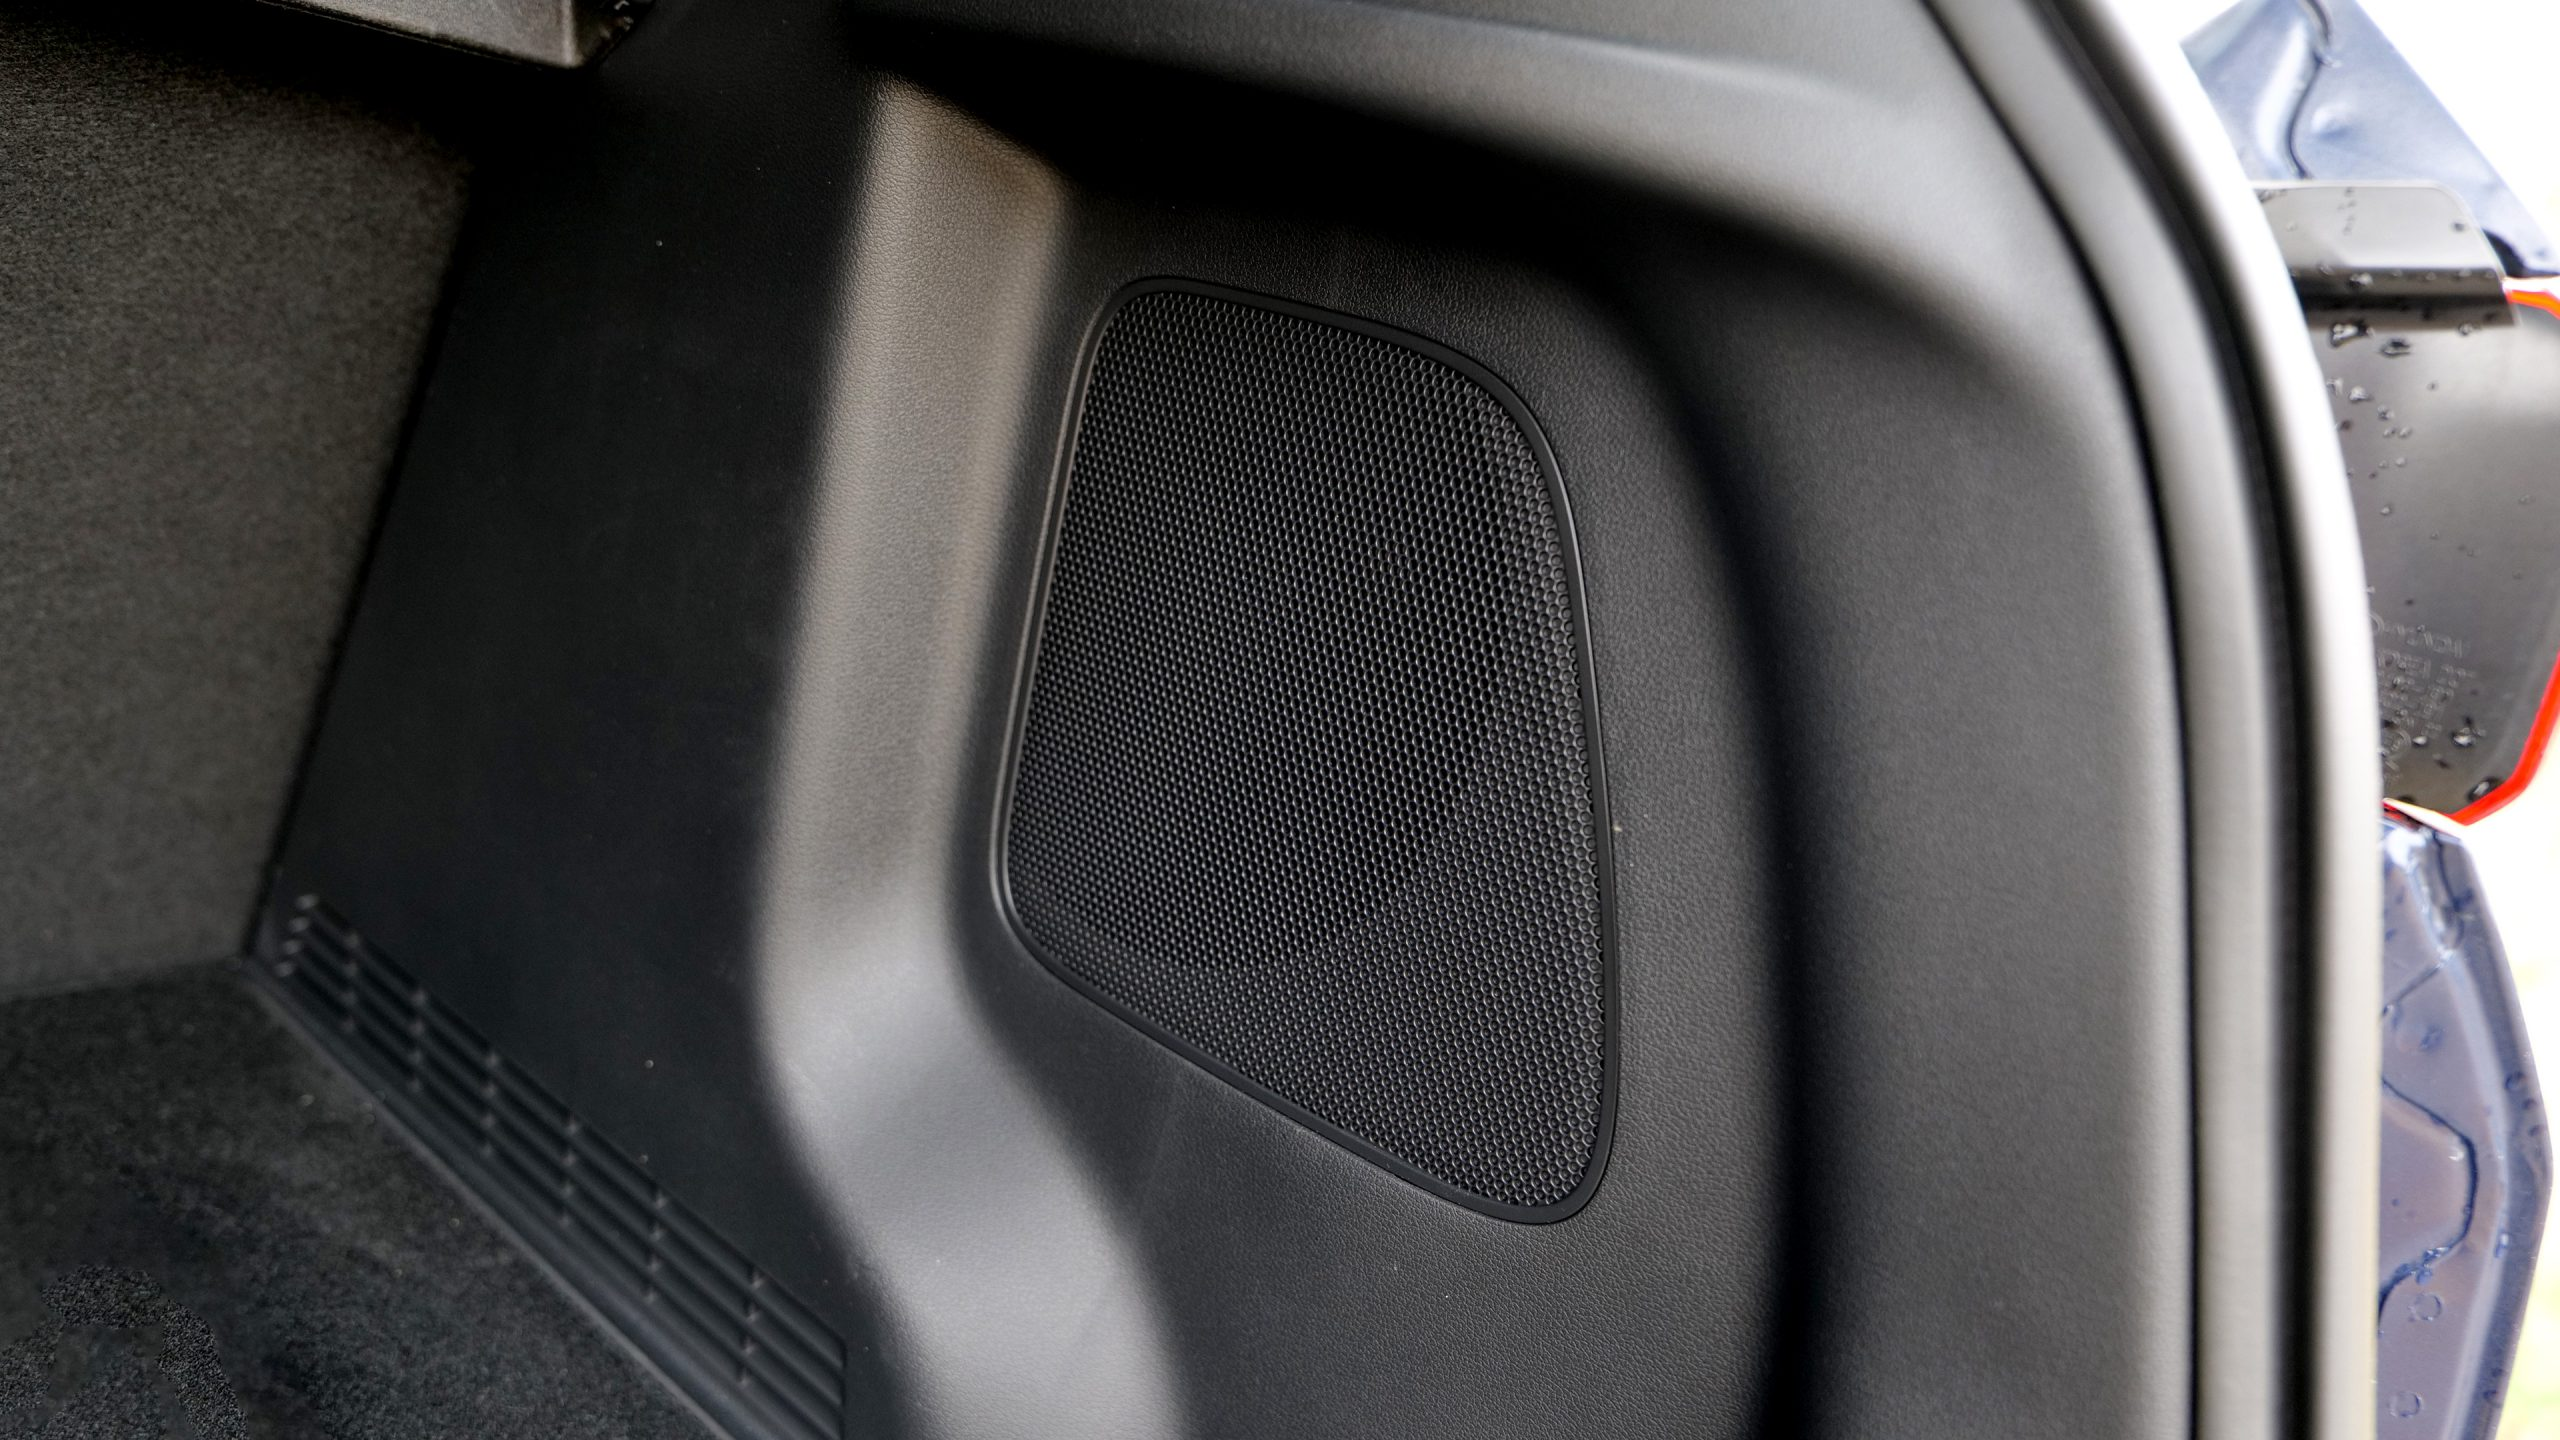 Hyundai Kona KRELL subwoofer